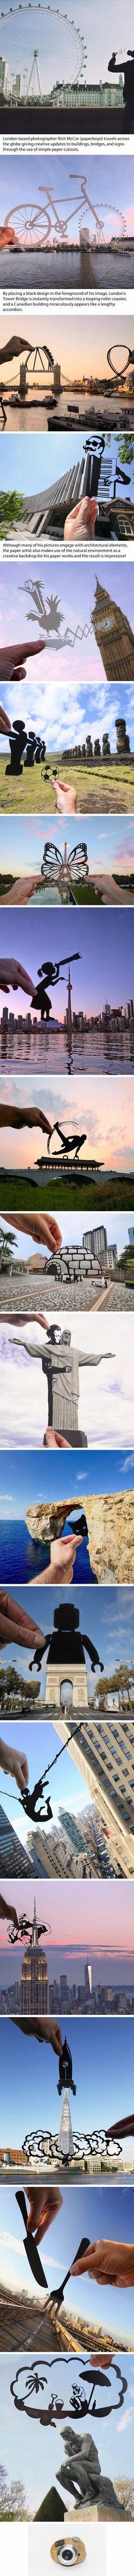 Paper Cutouts Transform Landmarks Around The World Into Scenes Of Temporary Amusement